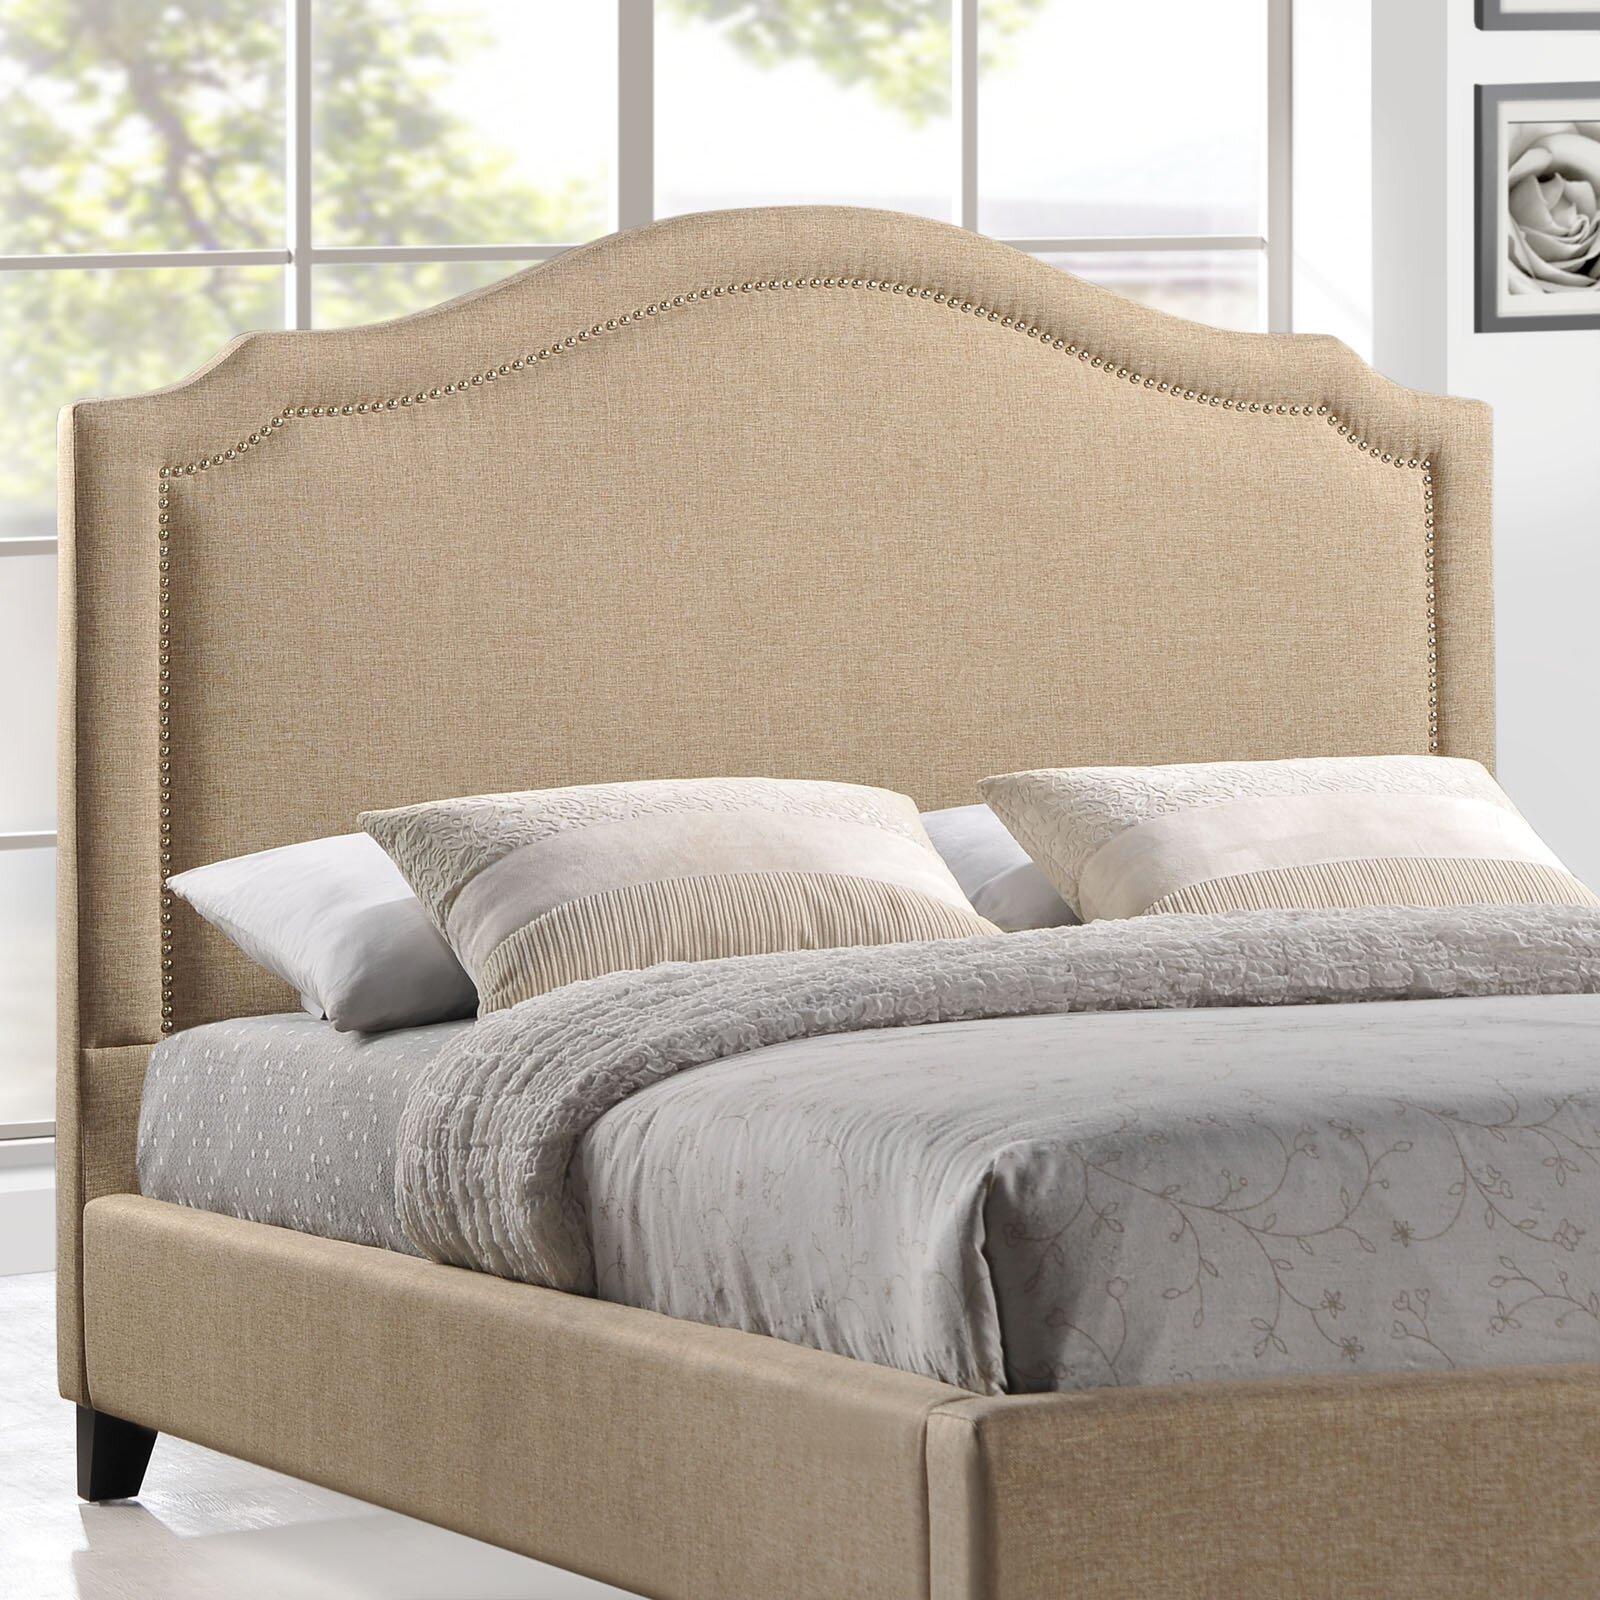 Modway Queen Upholstered Platform Bed Amp Reviews Wayfair